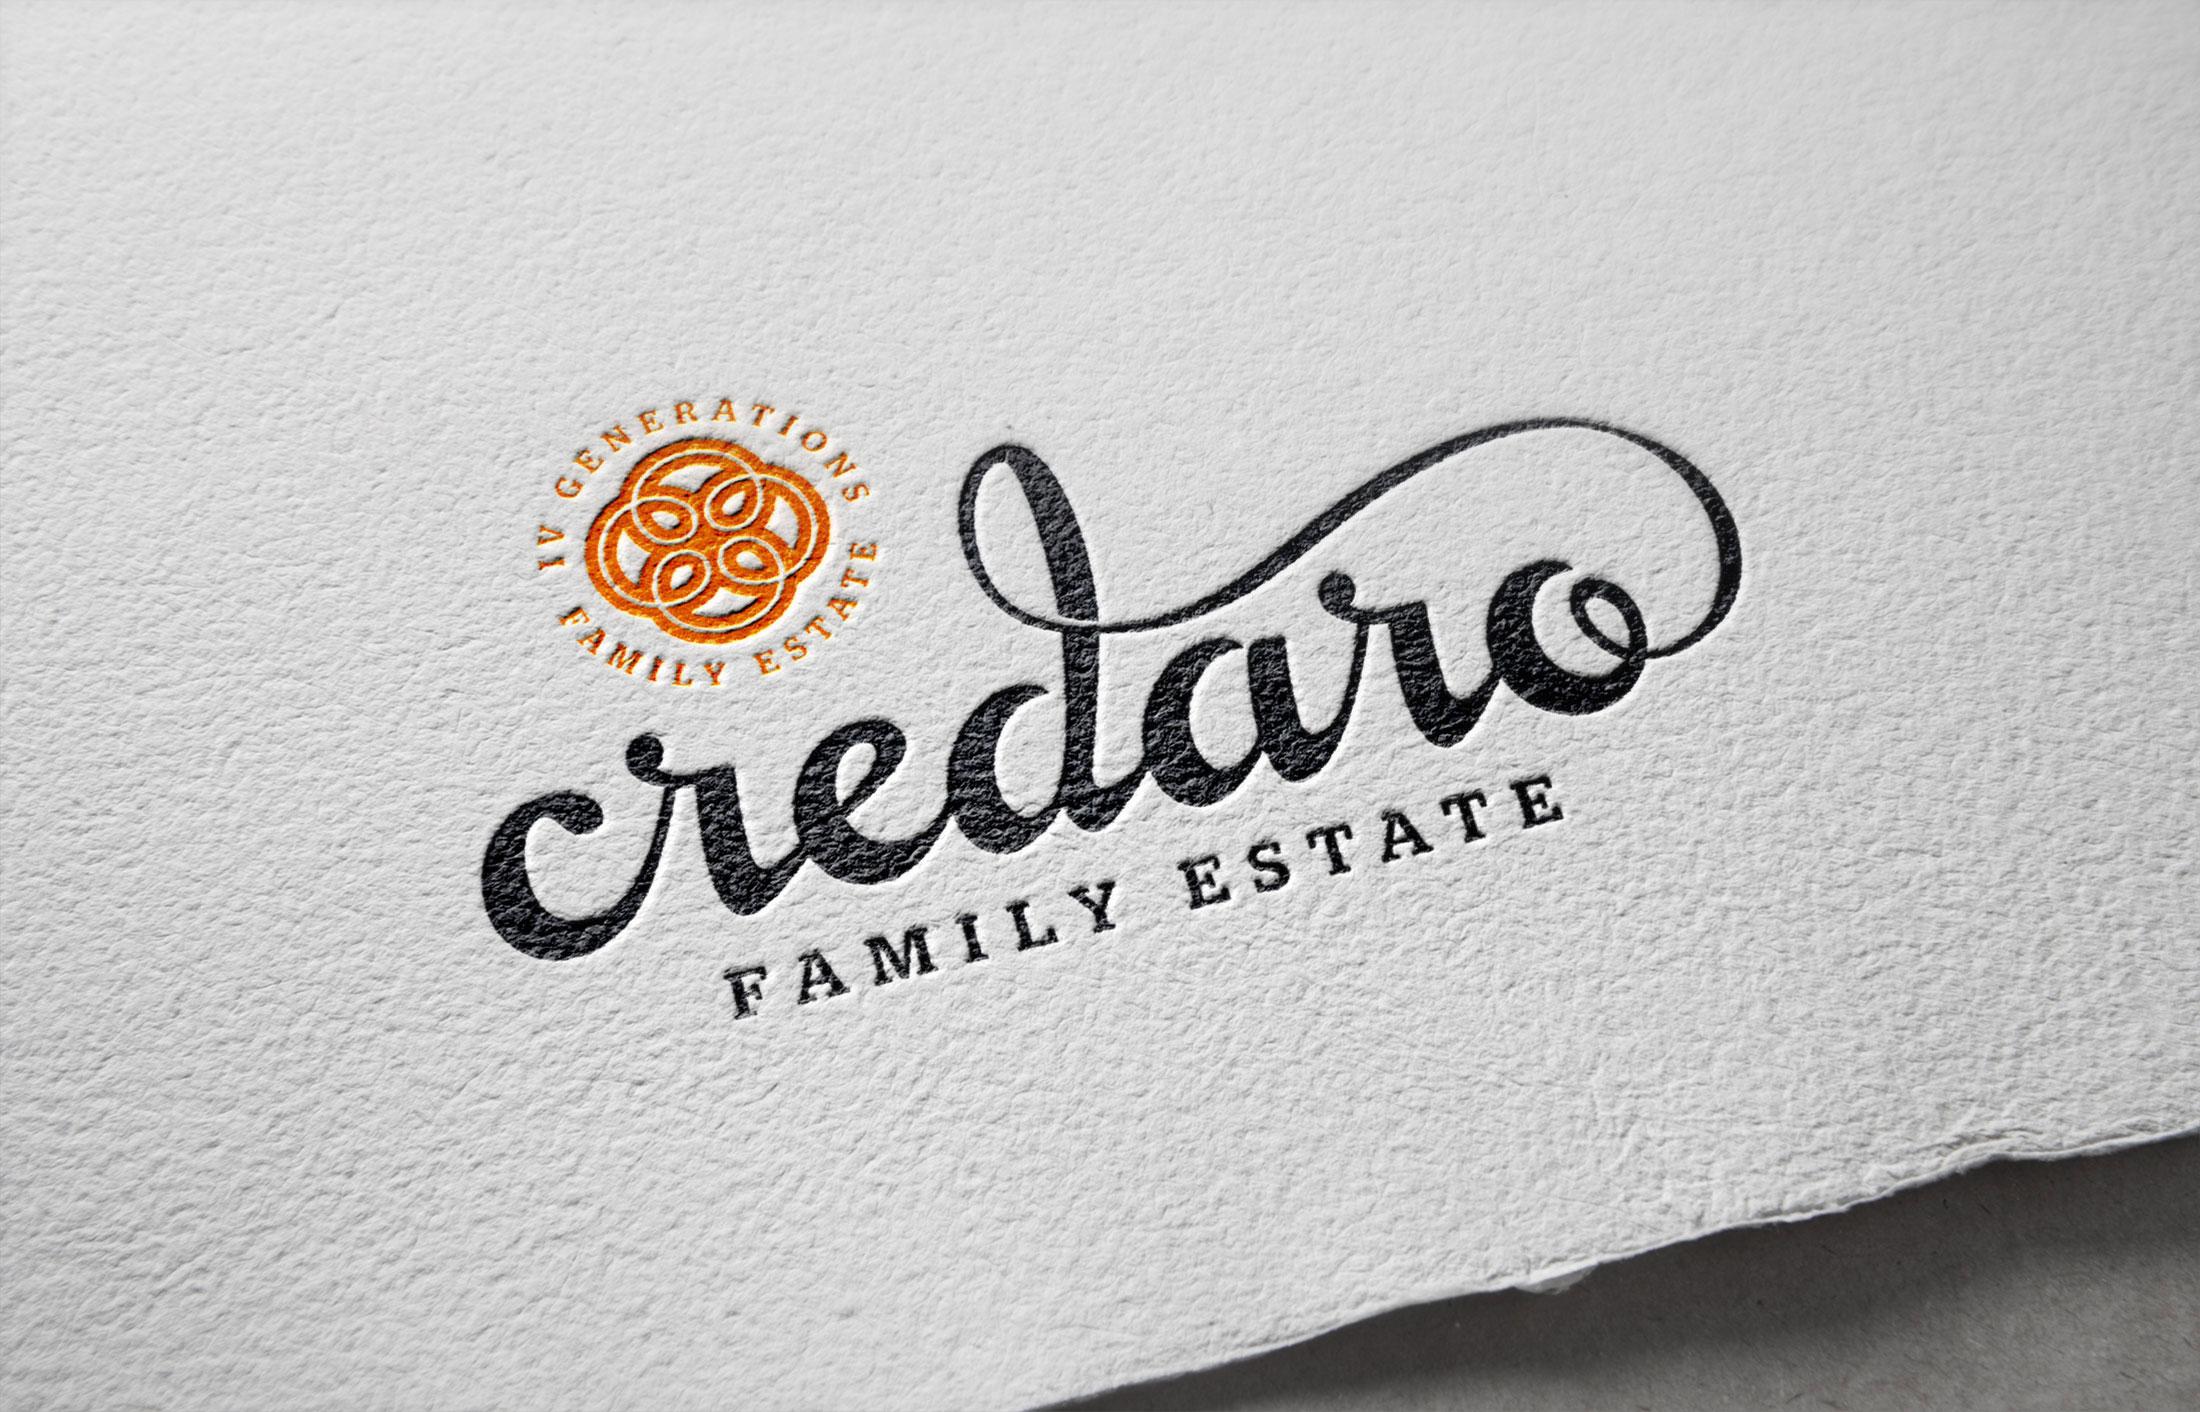 Credaro Family Estate – Brand